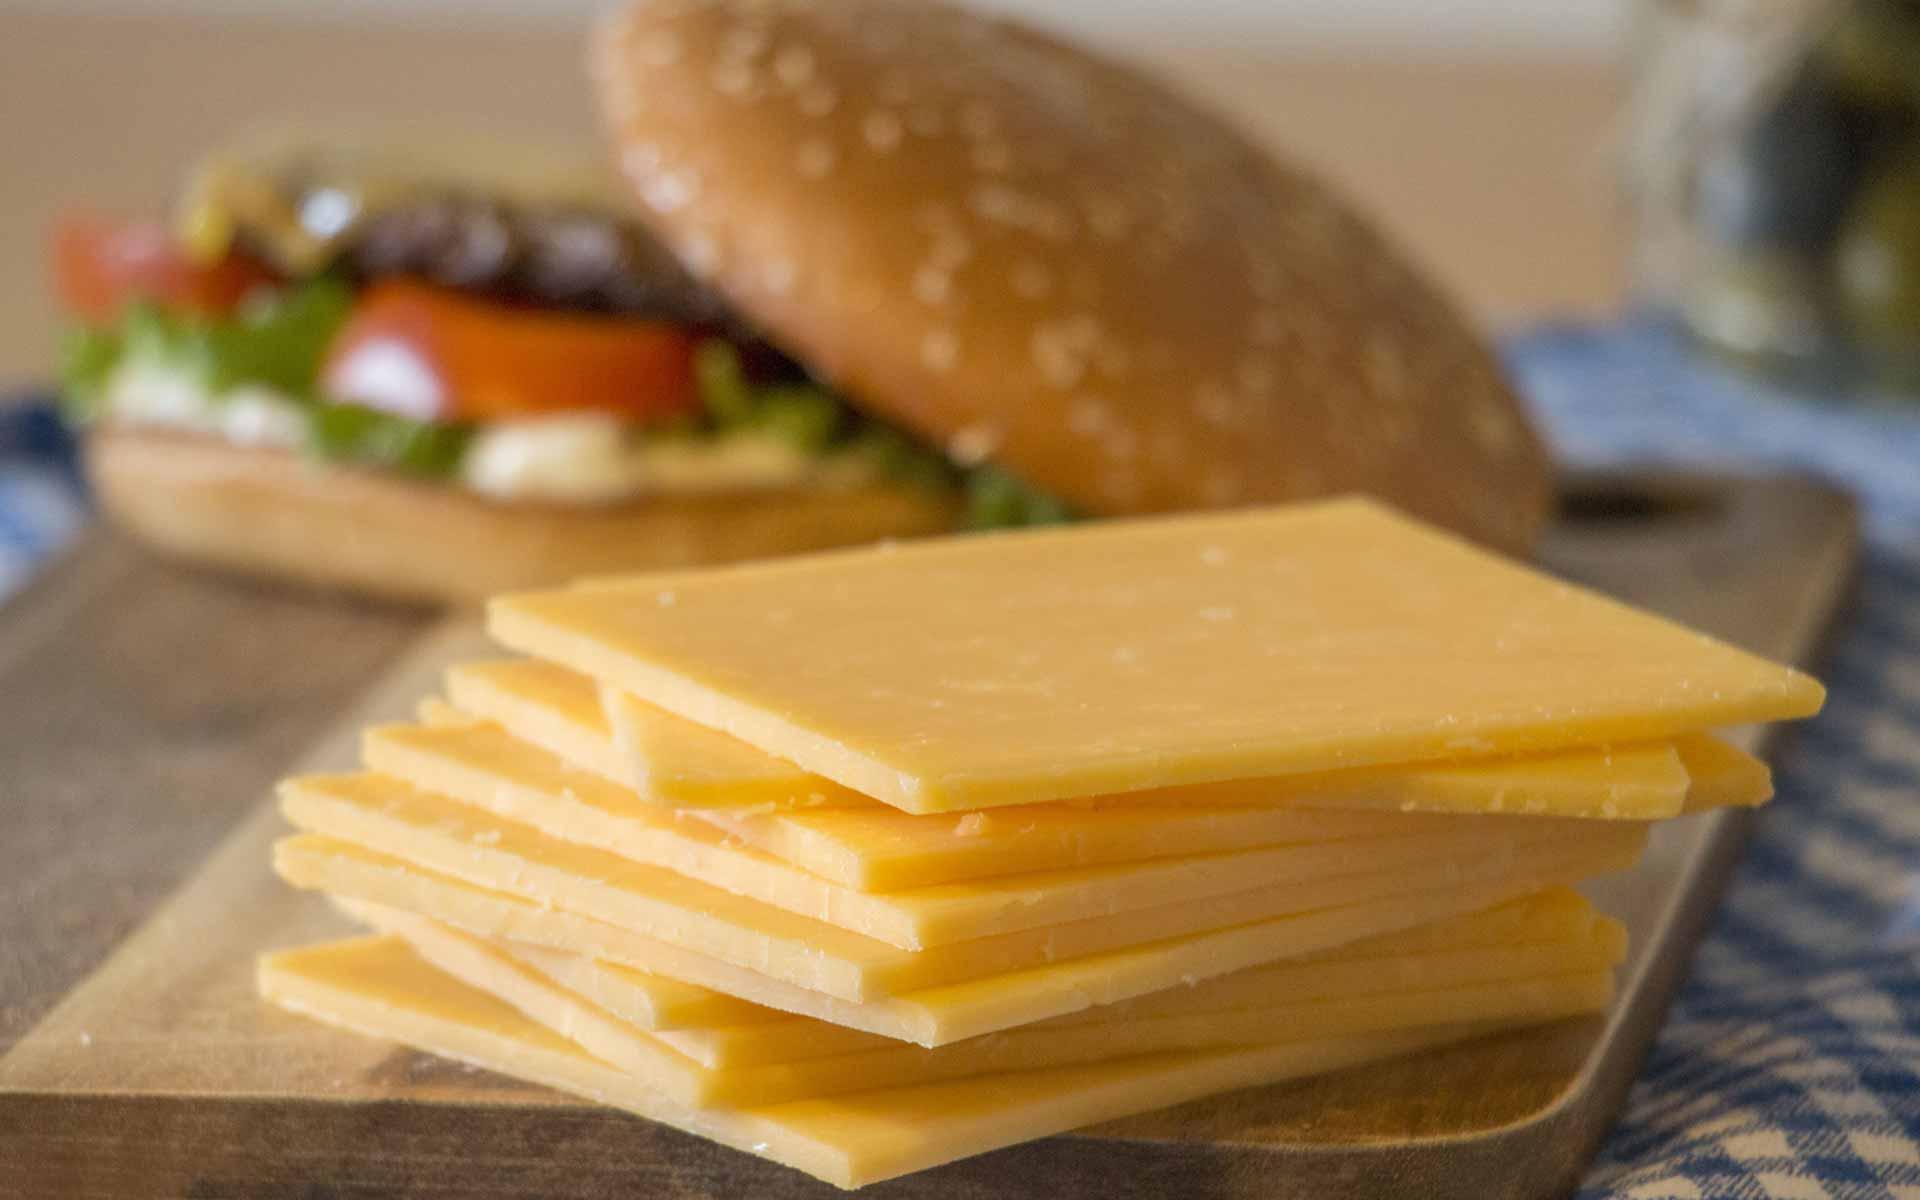 cheddar_burger_siivu_palsta